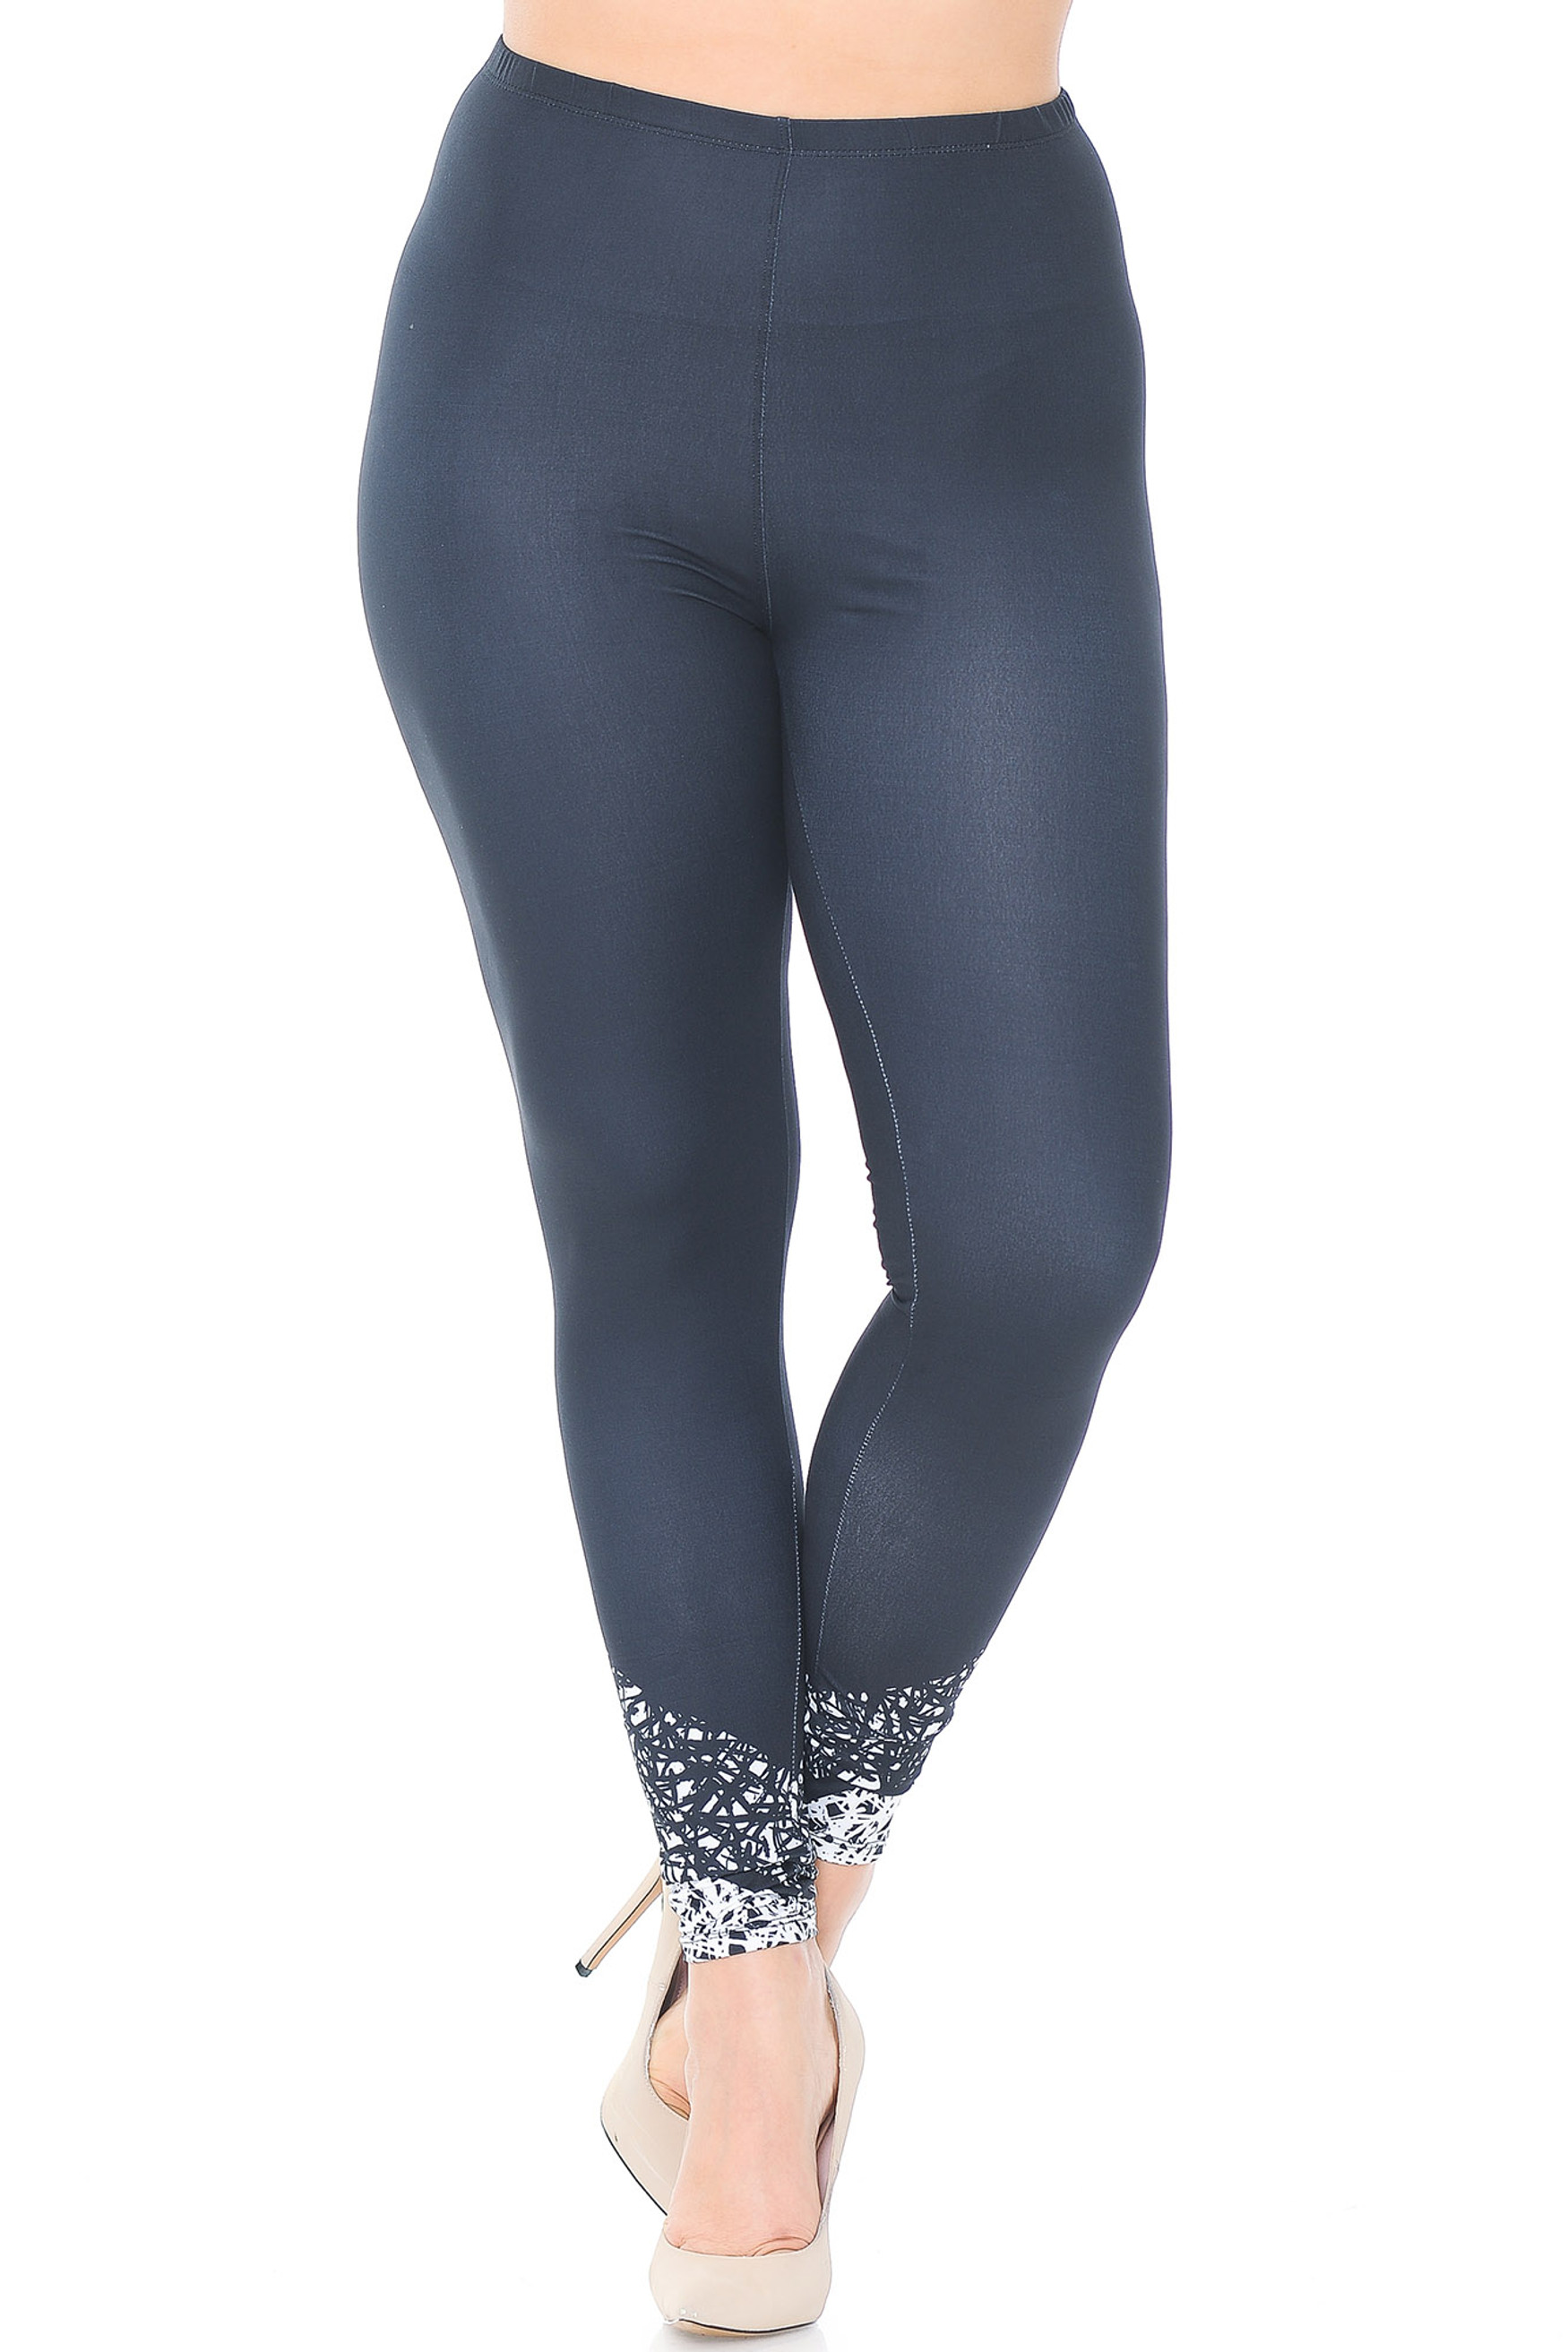 Creamy Soft Ebony Escapade Extra Plus Size Leggings - 3X-5X - USA Fashion™